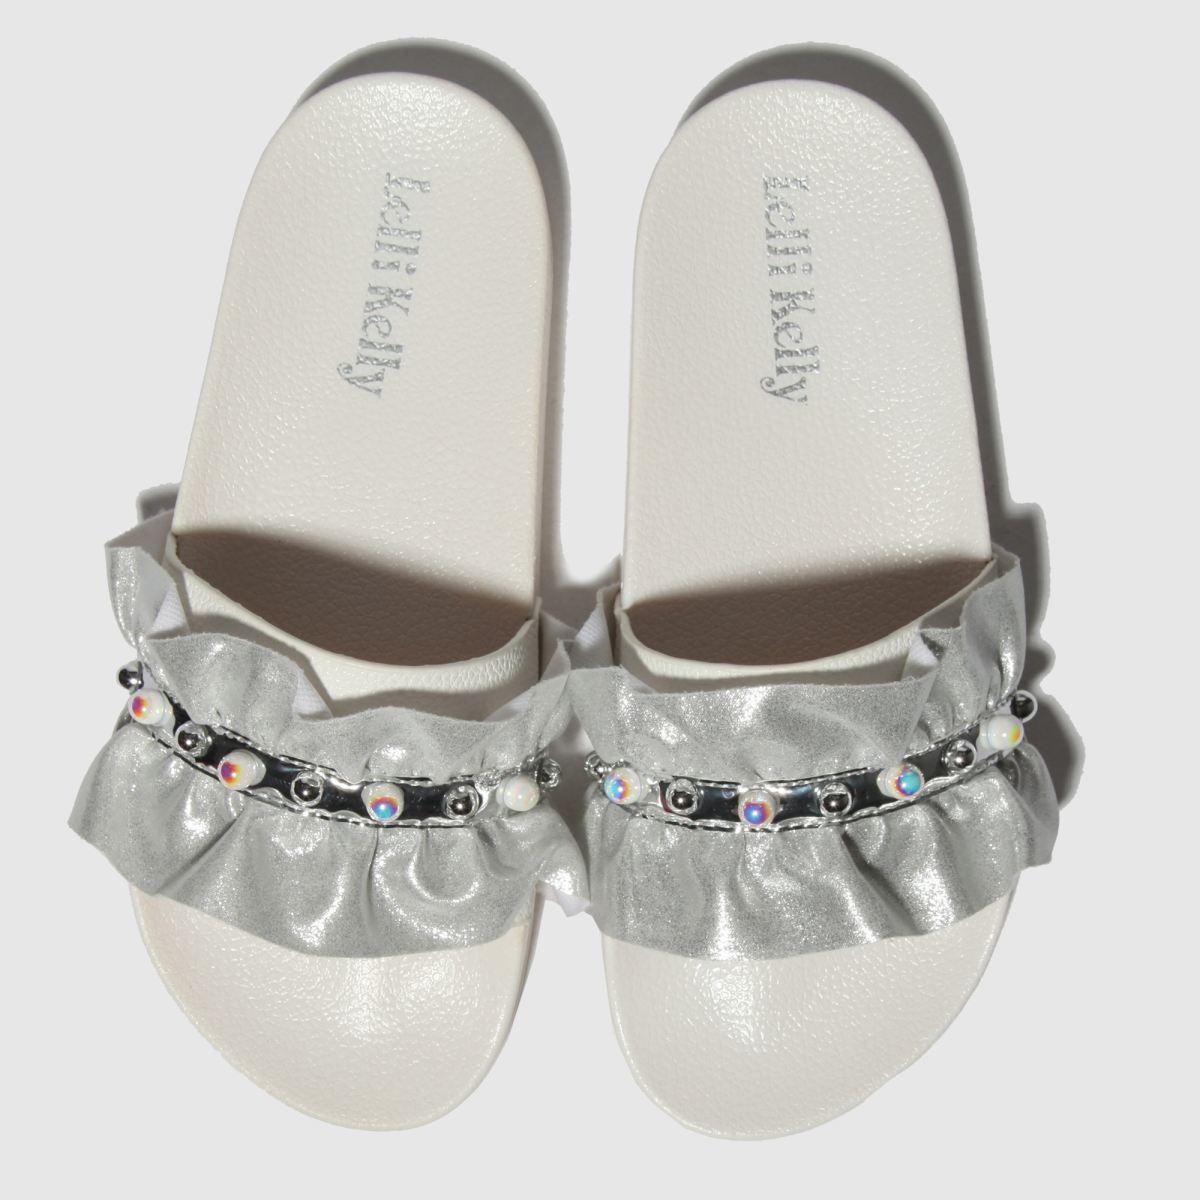 Lelli Kelly White & Silver Katia Sandals Junior